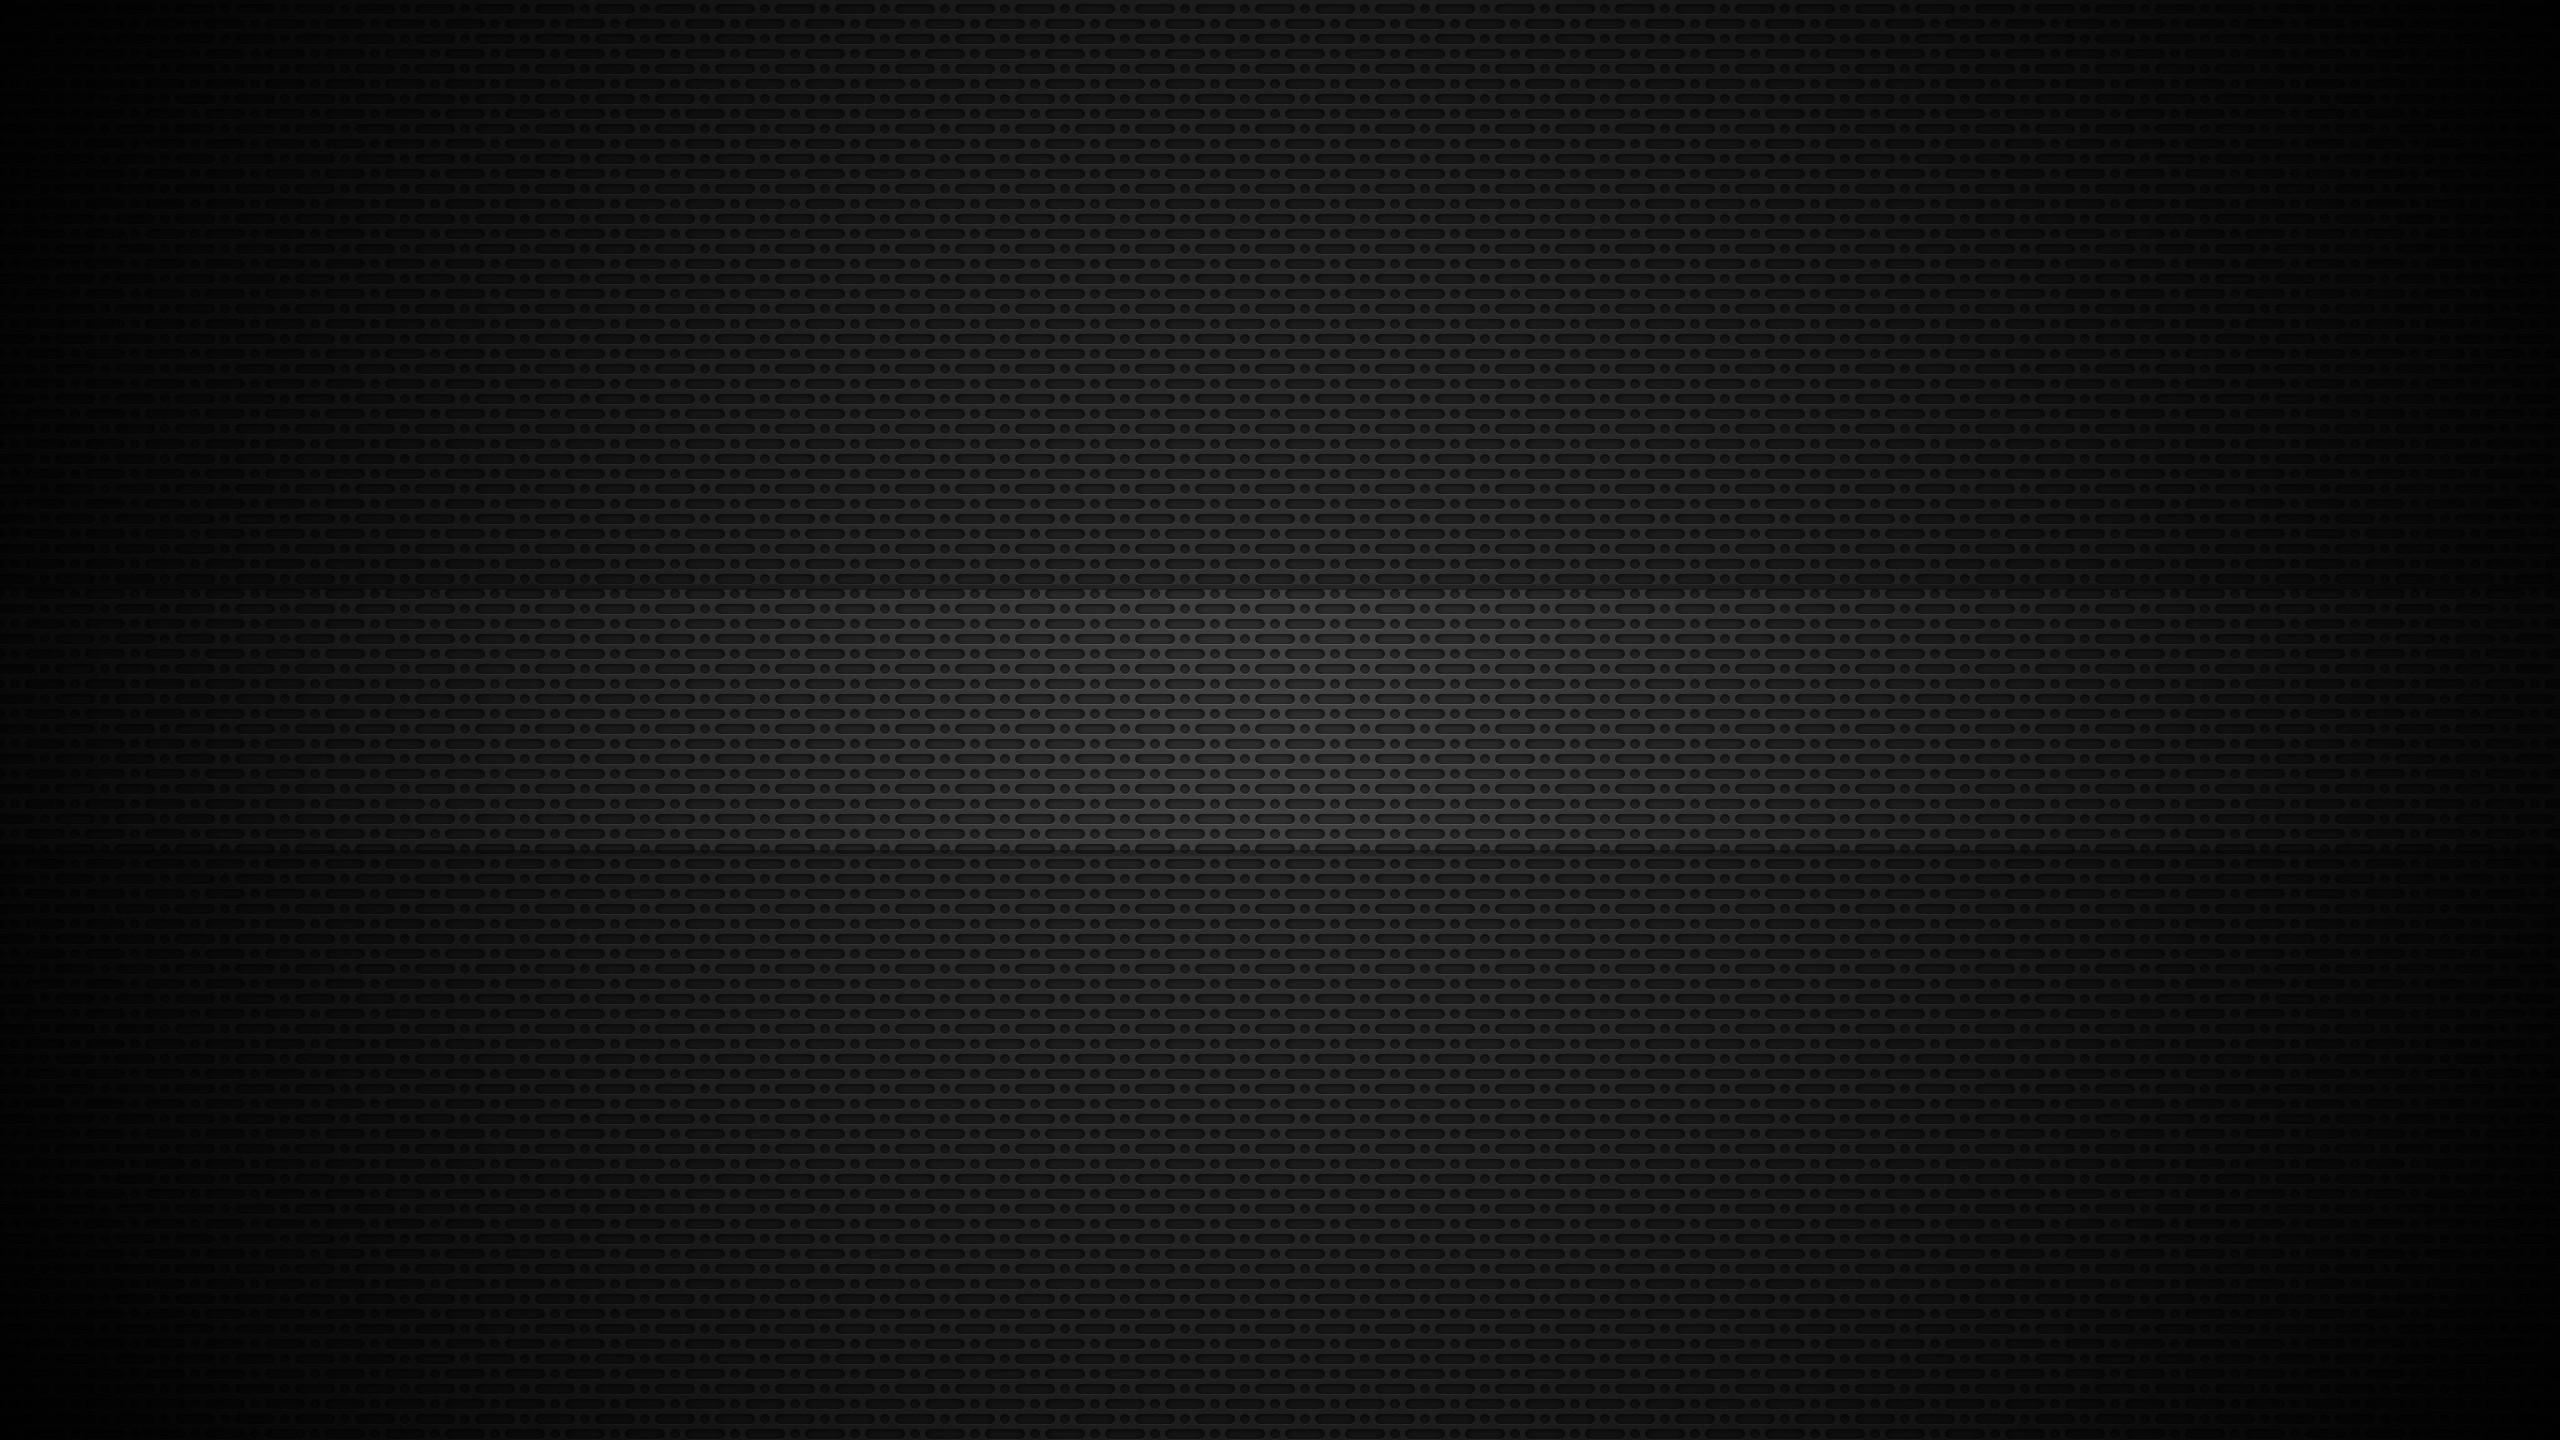 YouTube Gaming 2048X1152 Wallpaper Image Gallery – Photonesta